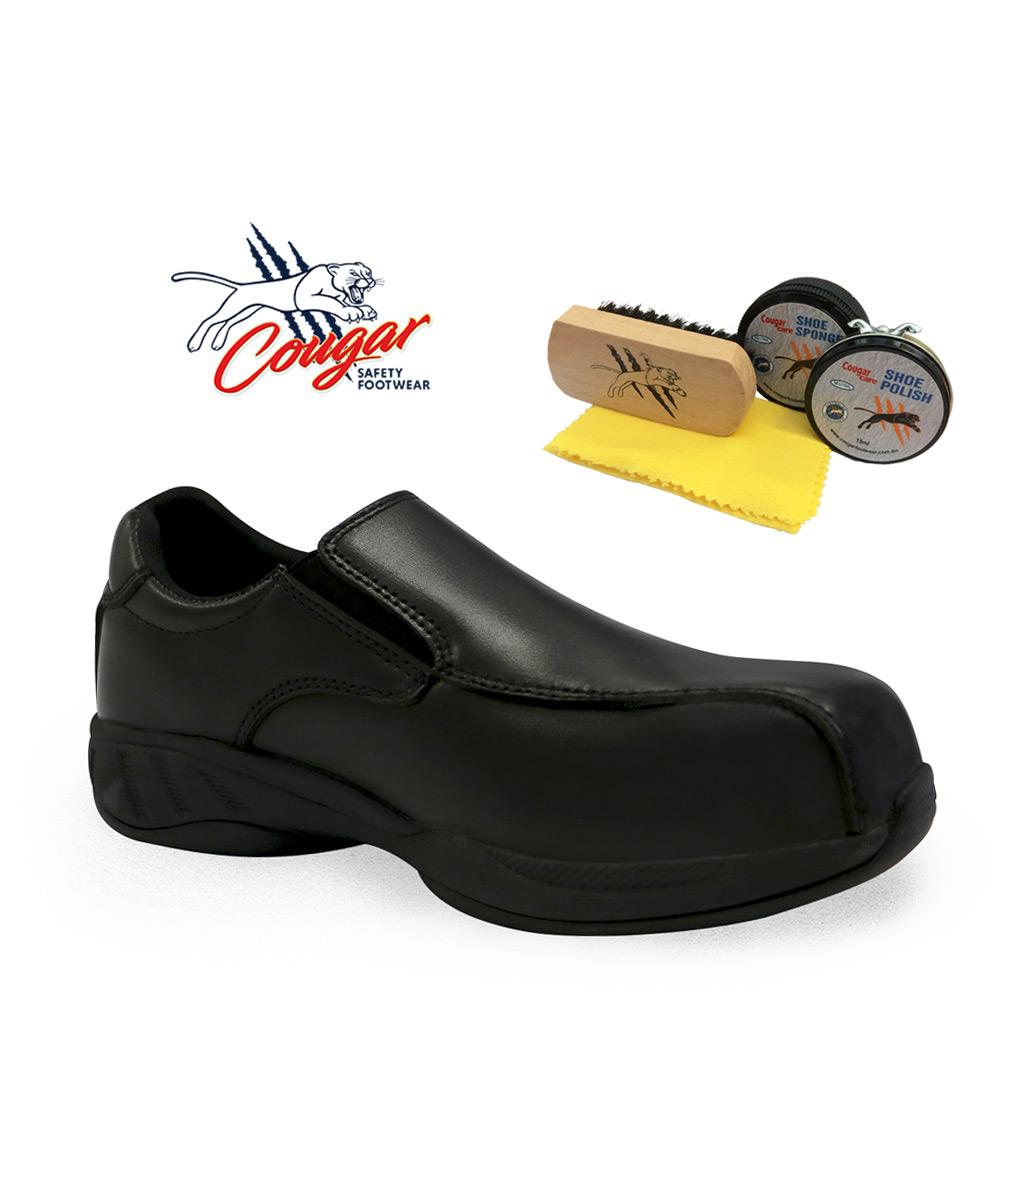 93062ef69171 Mascot Safety Shoes by Cougar + FREE Polishing Kit – chef.com.au